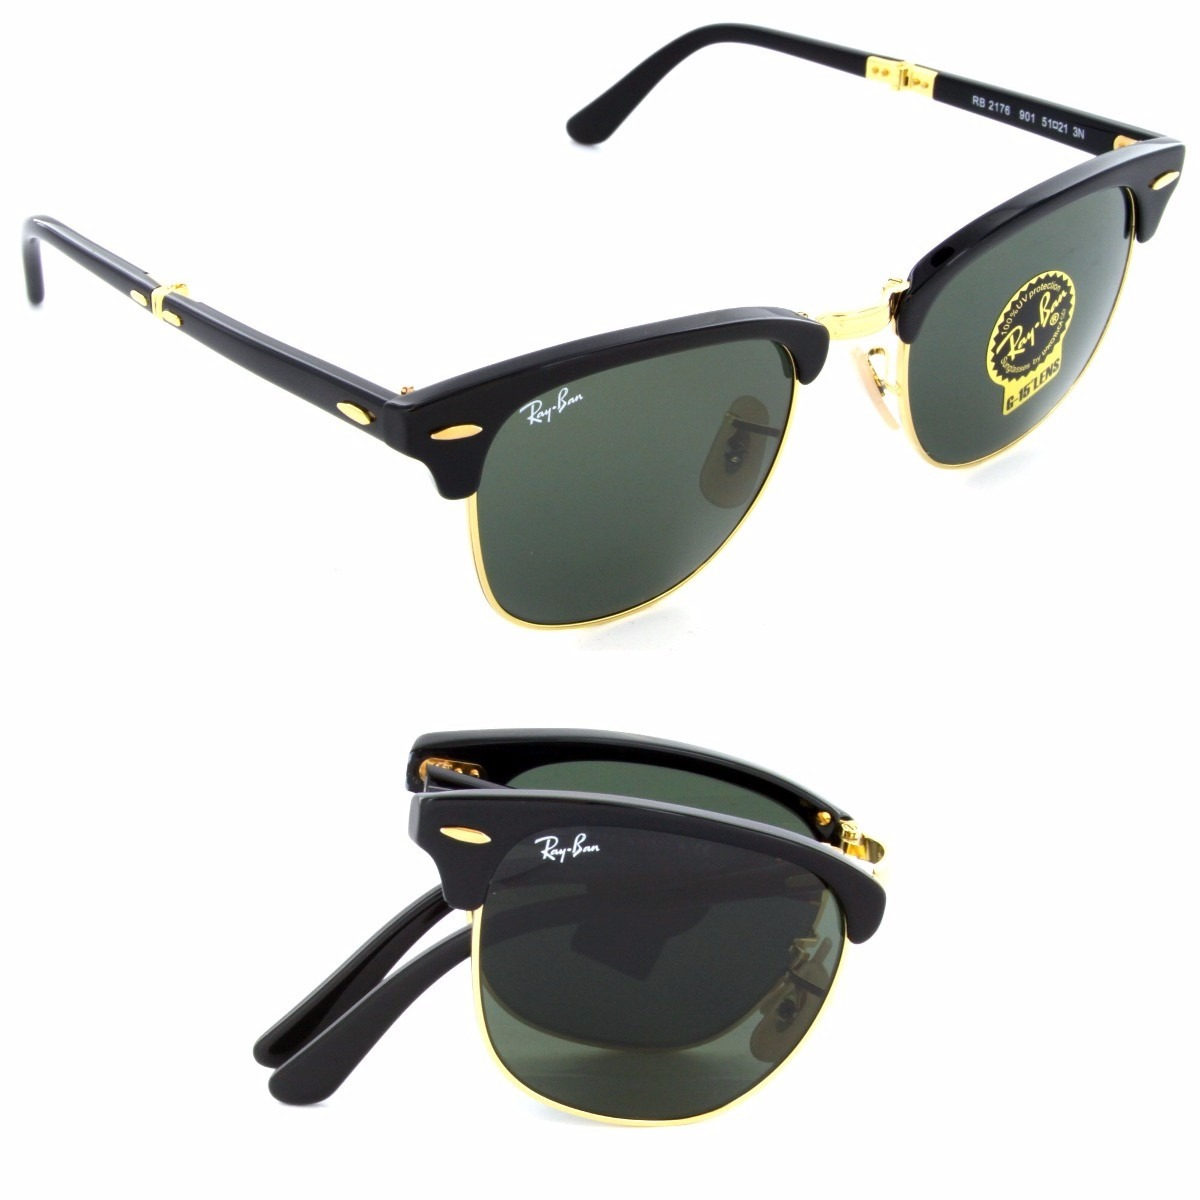 3b37aa6f53fb6 oculos rayban 3016 51 clubmaster dobravel oferta 50% off. Carregando zoom.